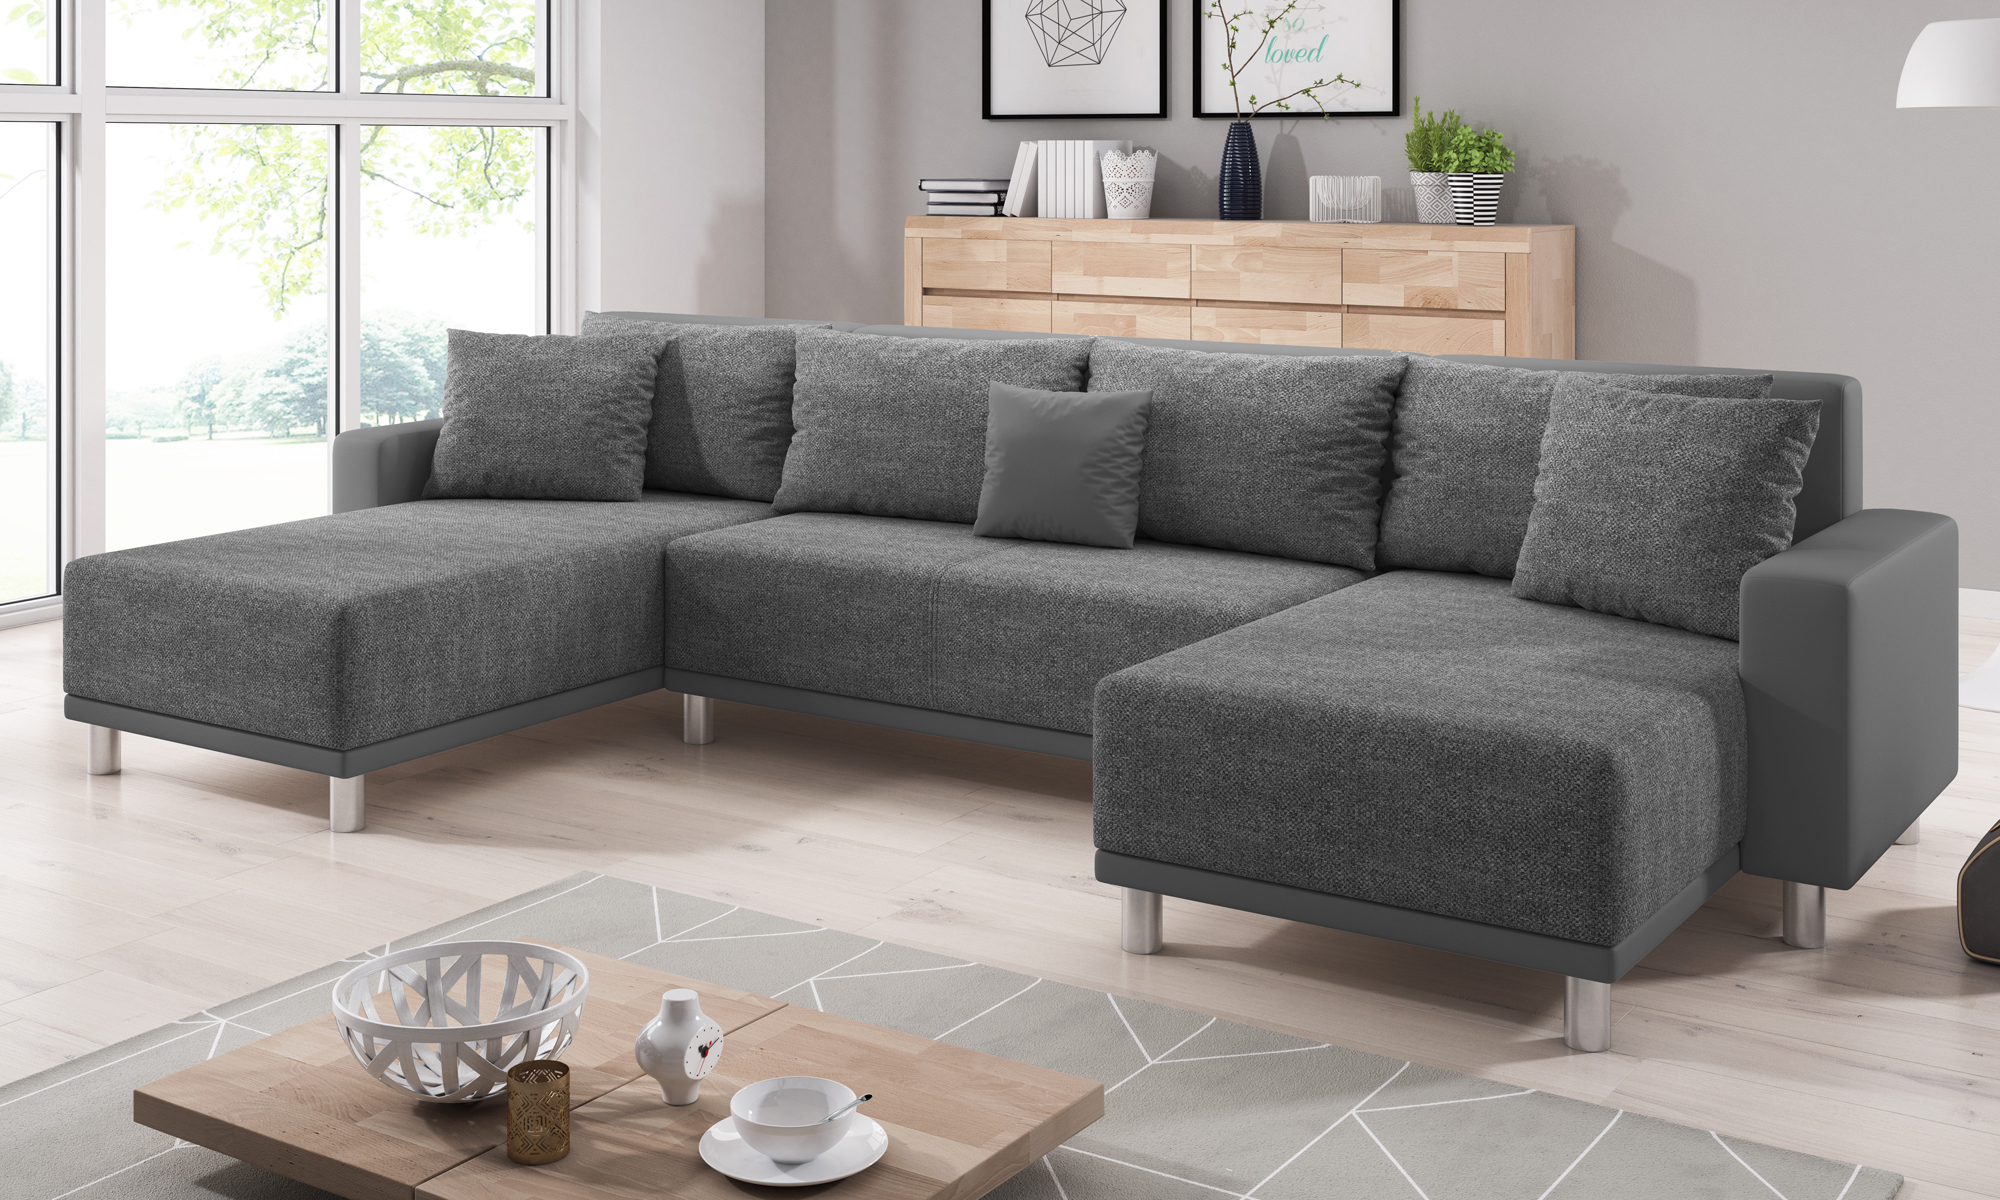 sofa road grau u form schlafsofa ecksofa wohnen. Black Bedroom Furniture Sets. Home Design Ideas